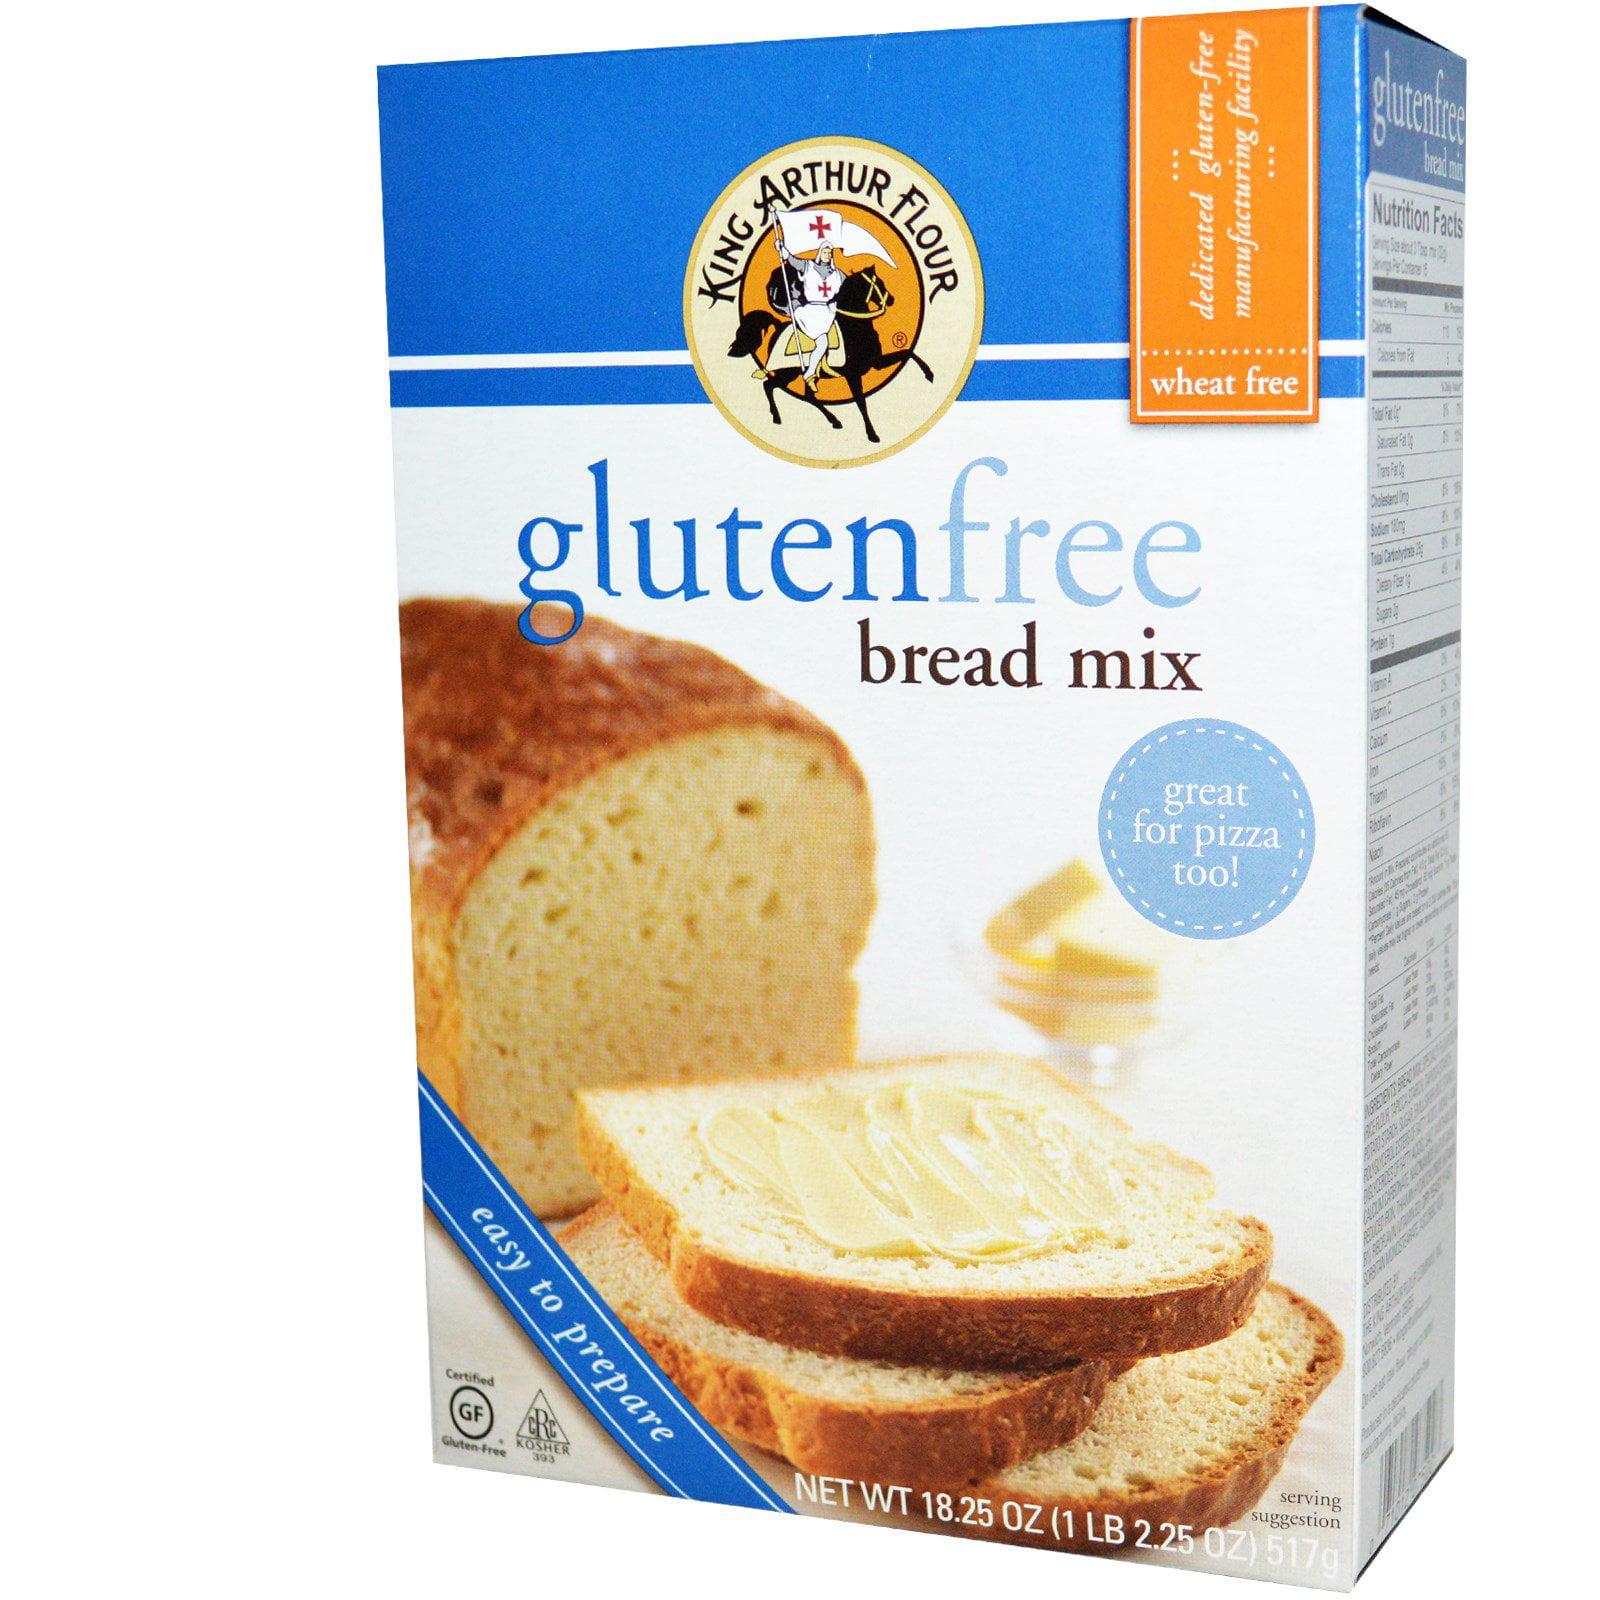 King Arthur Flour, Gluten Free Bread Mix, 18.25 oz (pack of 3)